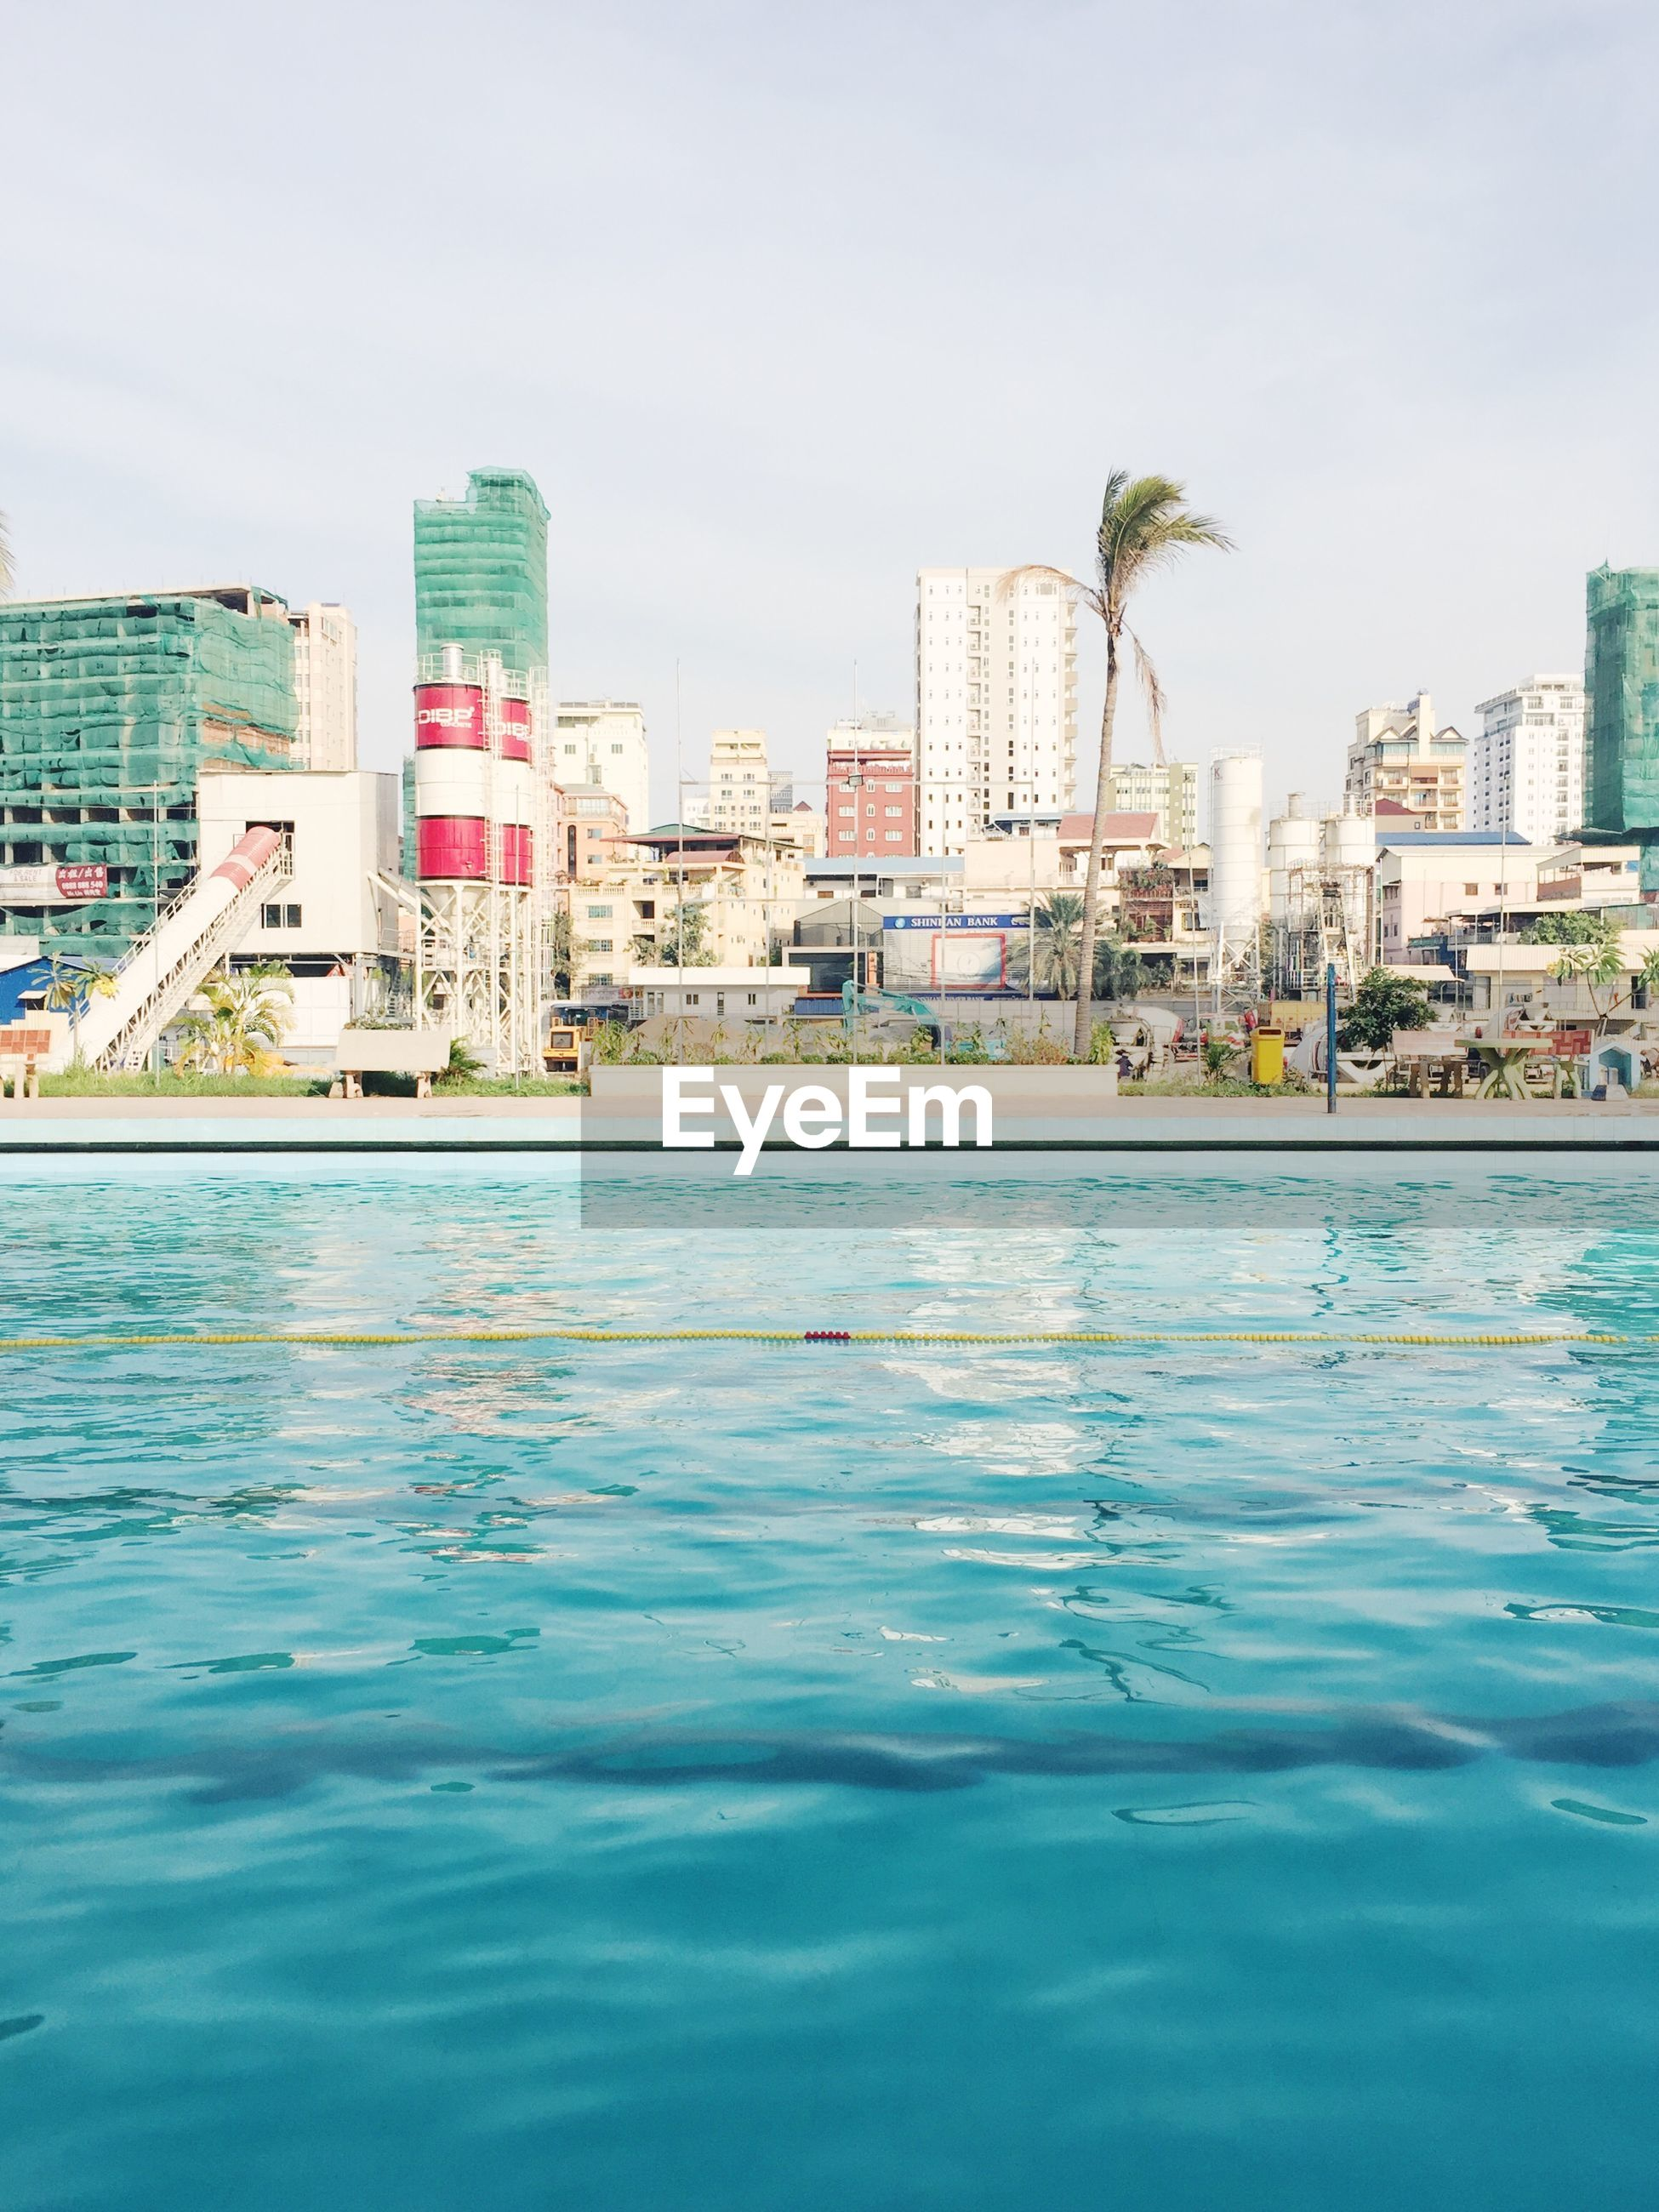 Swimming pool at phnom penh olympic stadium in city